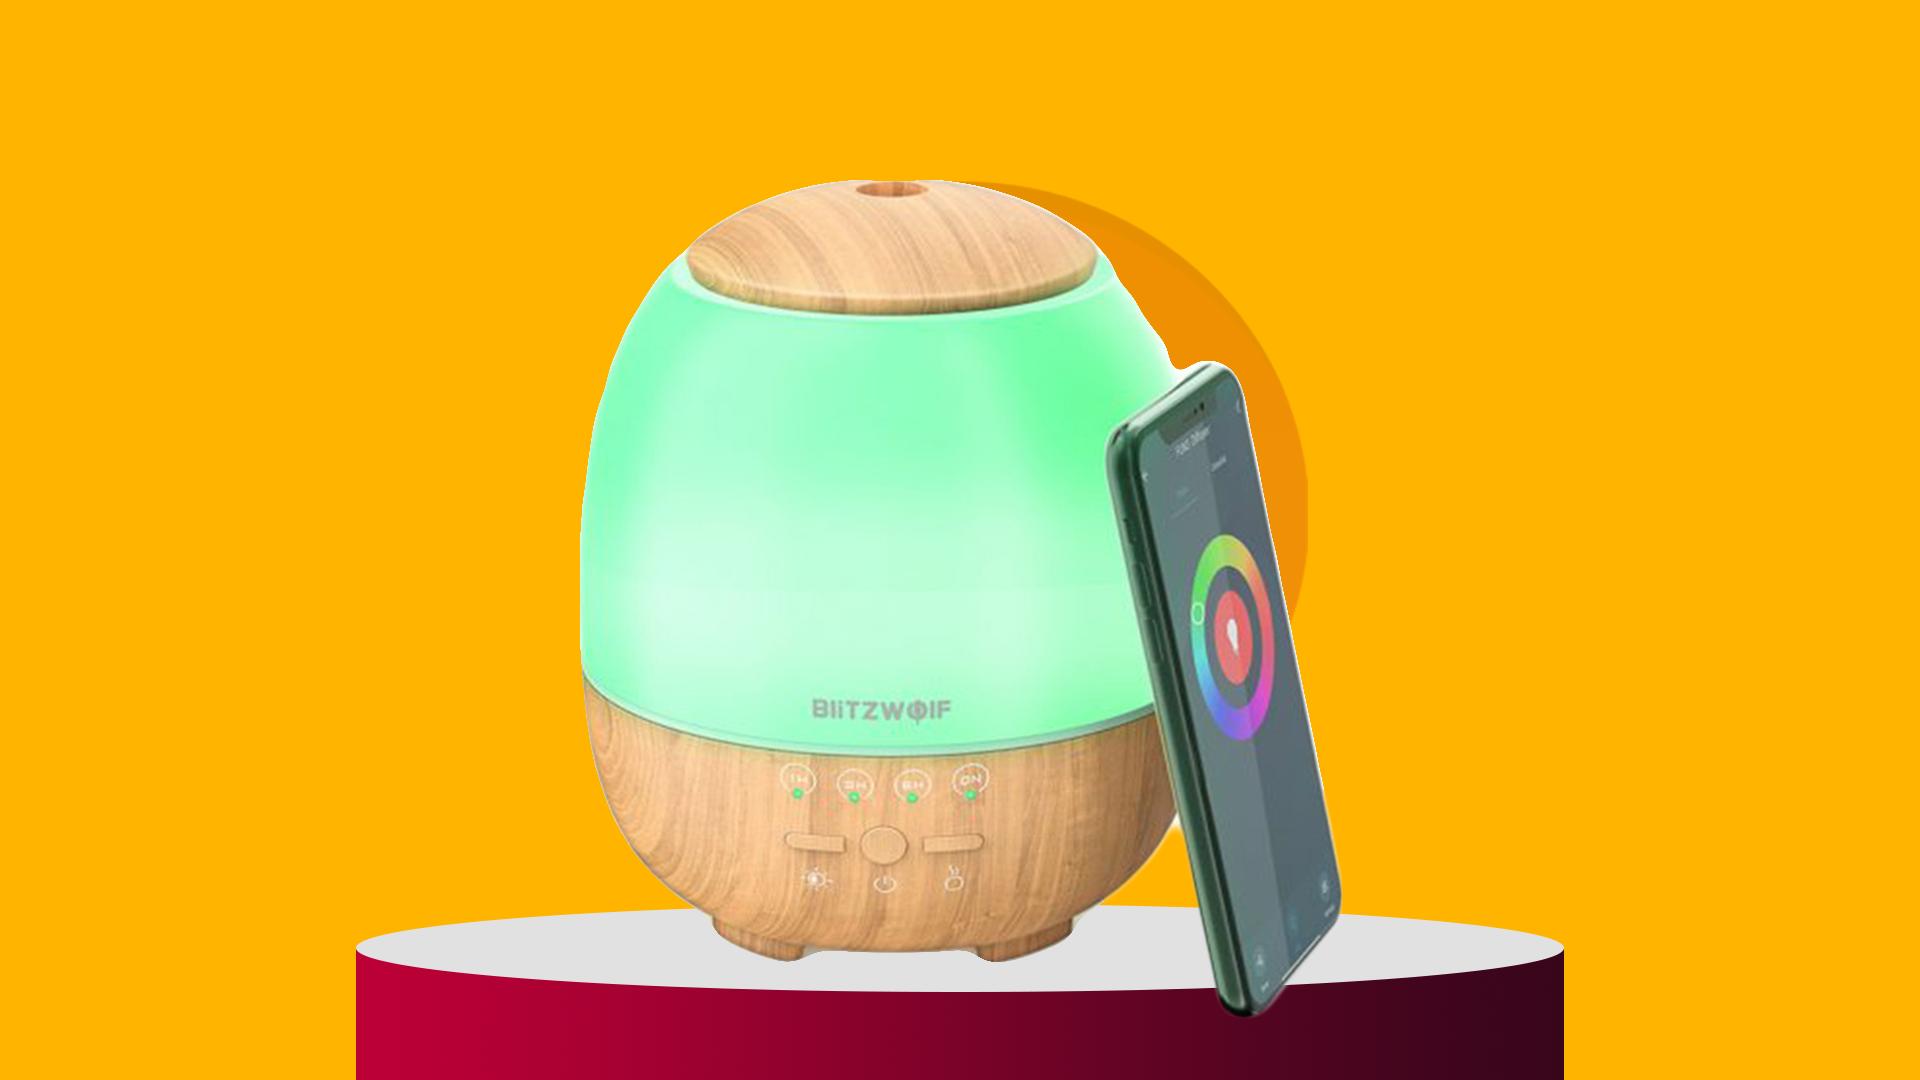 BlitzWolf® BW-FUN3 Wi-Fi Essential Oil Diffuser deal